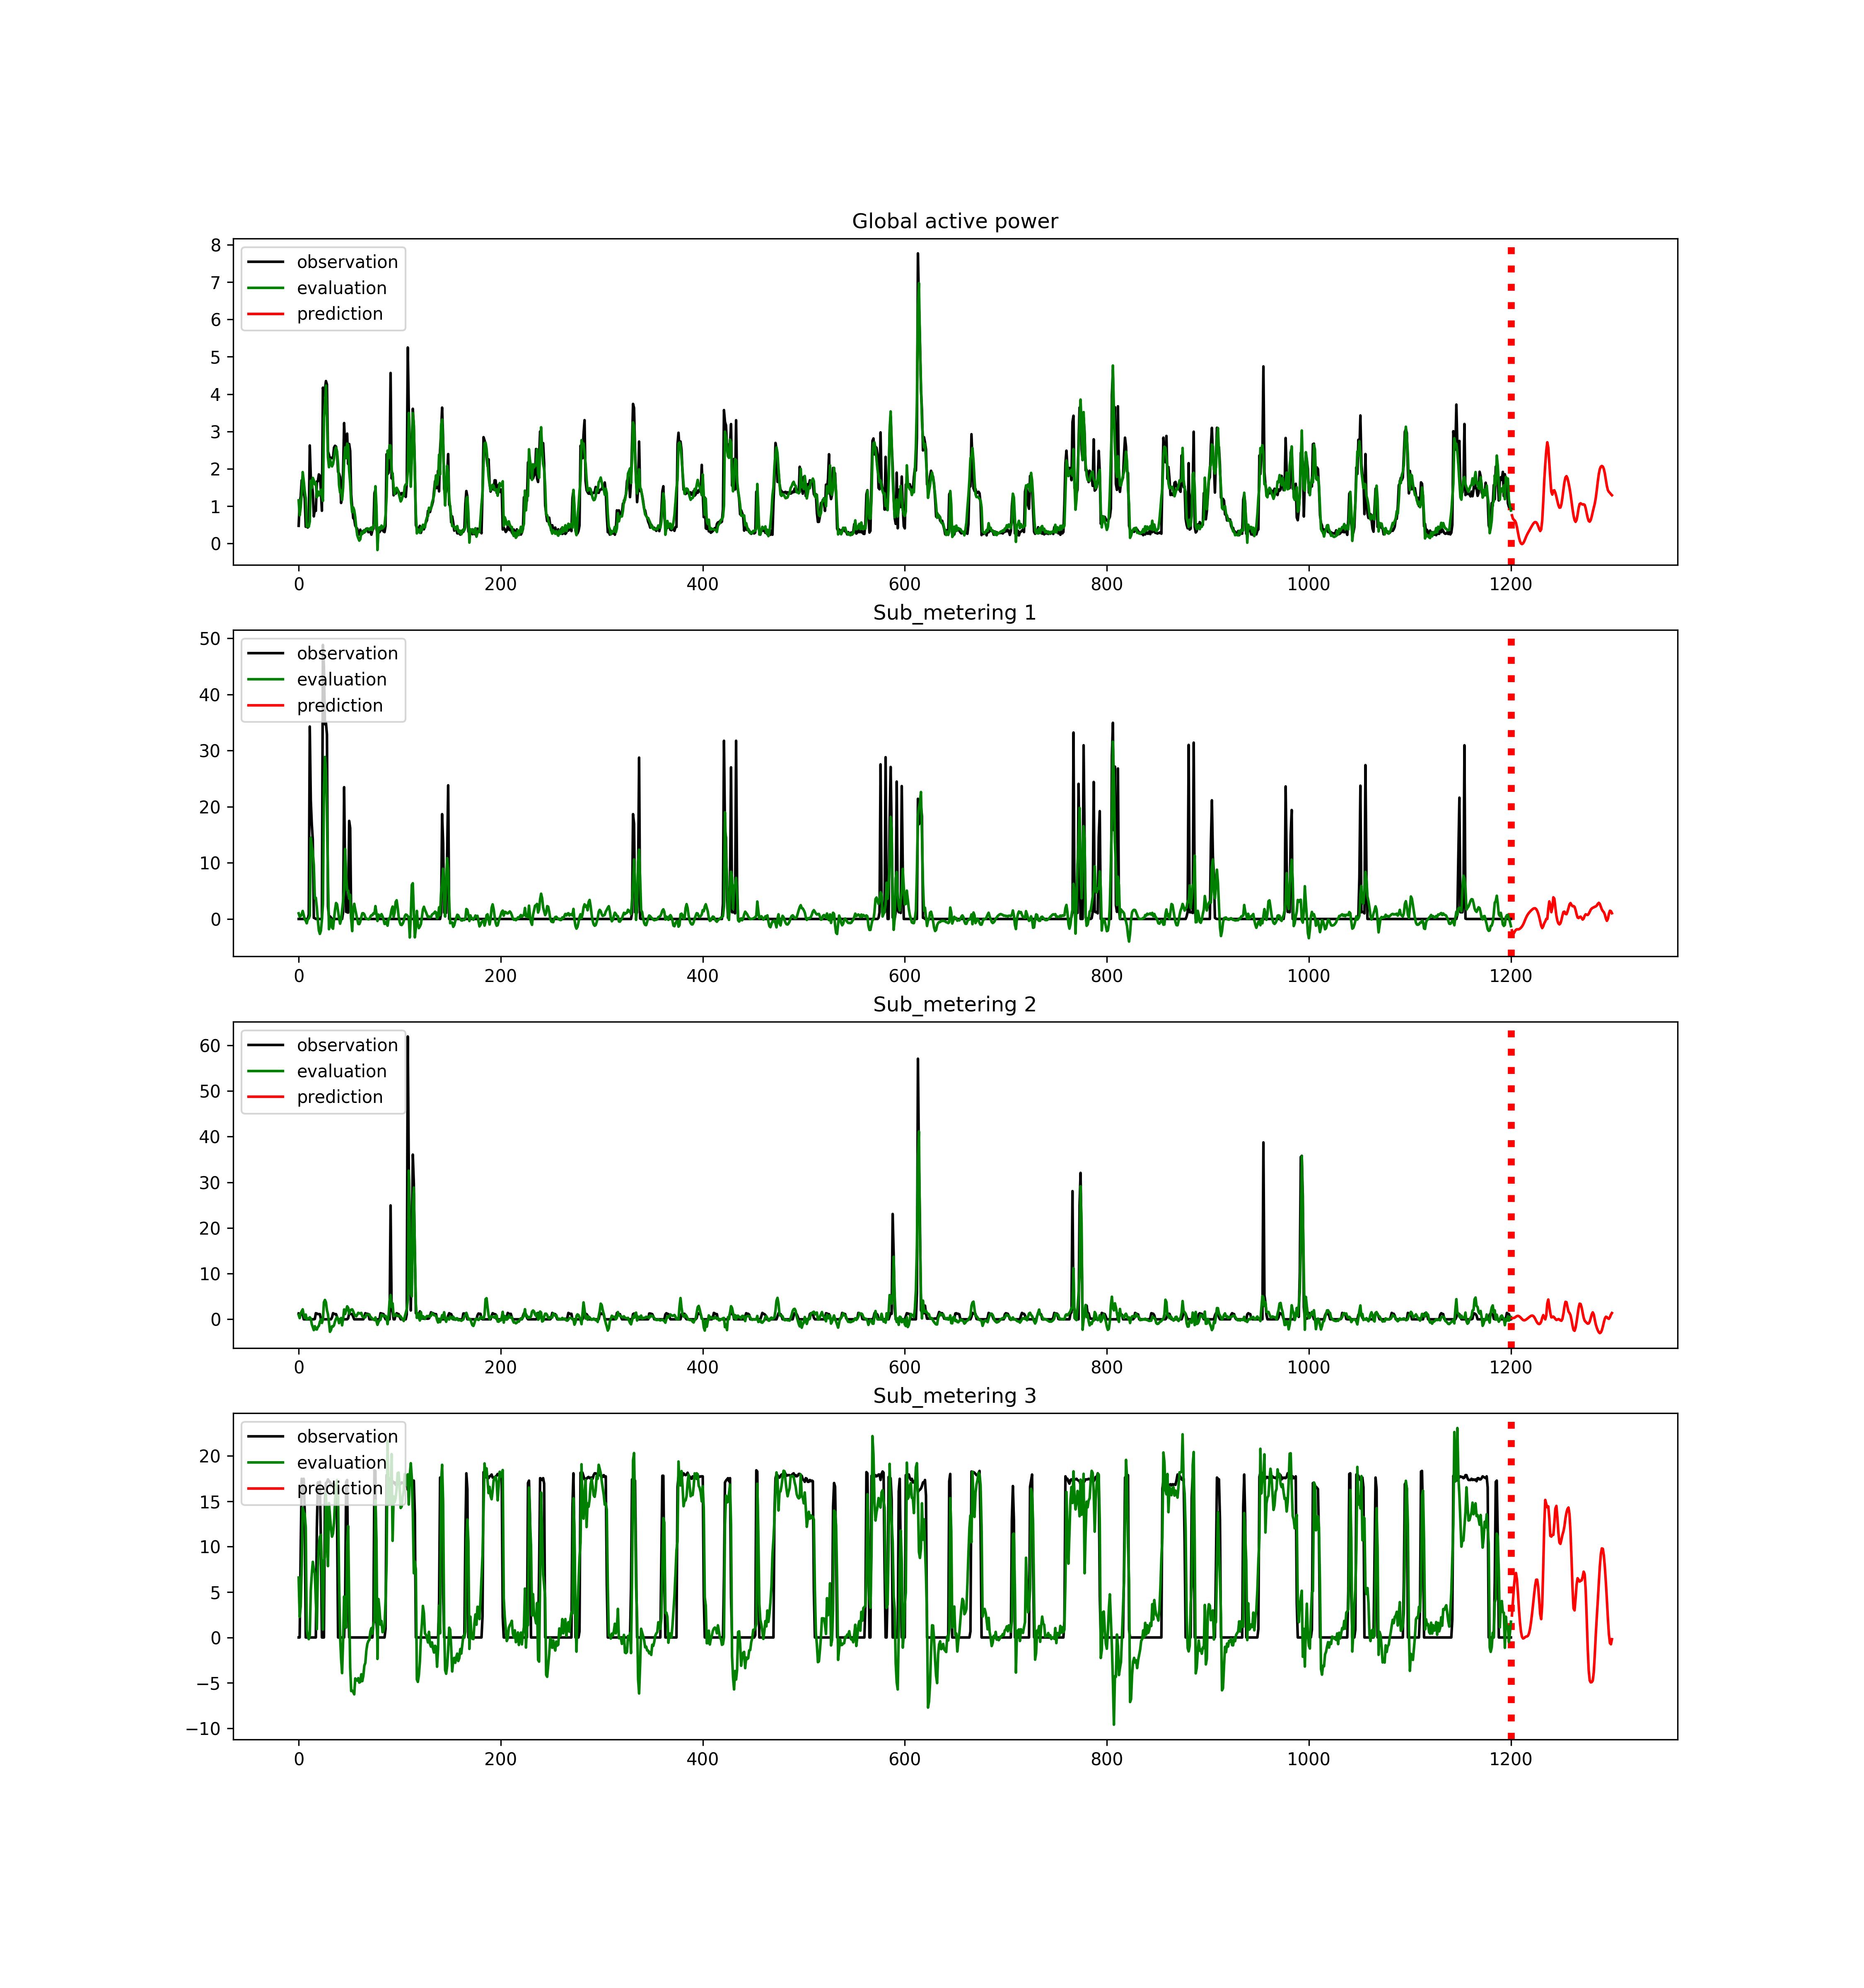 GitHub - Jenniferz28/Time-Series-ARIMA-XGBOOST-RNN: Time series